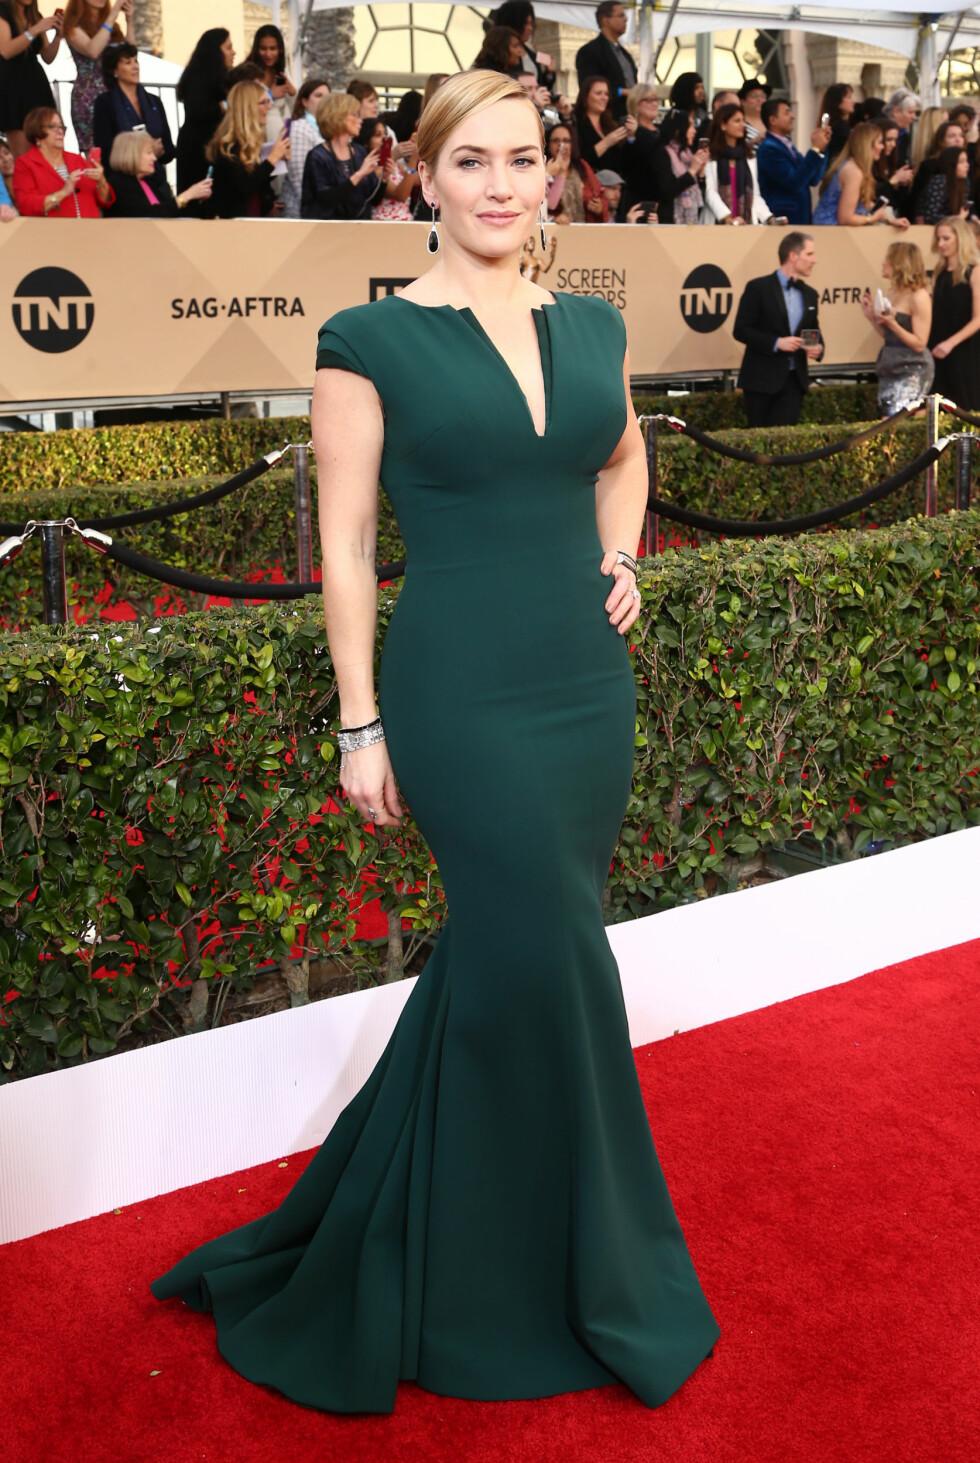 2016: Denne kjolen sitter som støpt på Kate Winslet. Foto: Ap